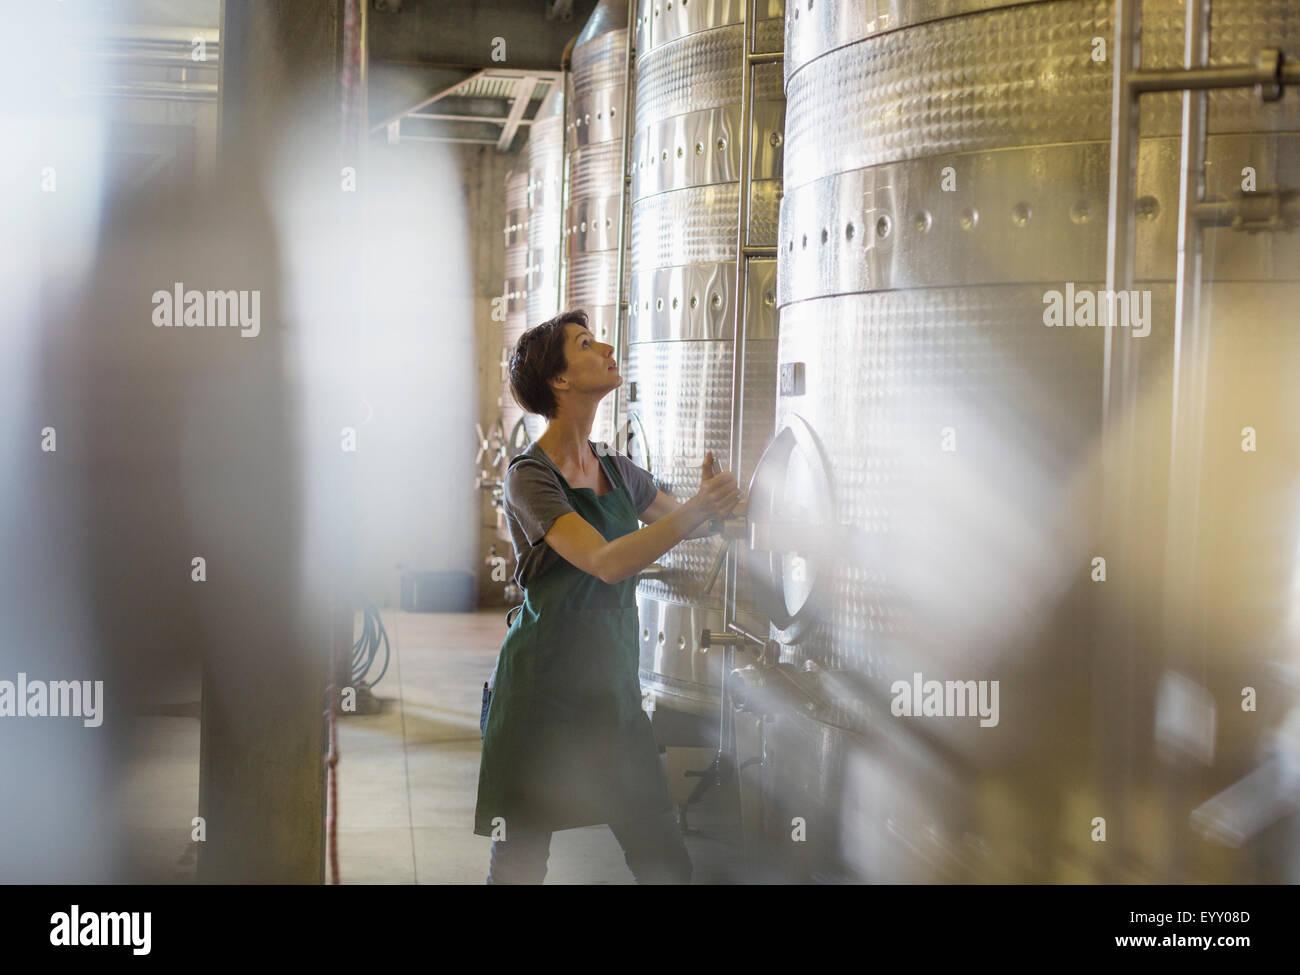 Vintner checking stainless steel vat in winery cellar - Stock Image